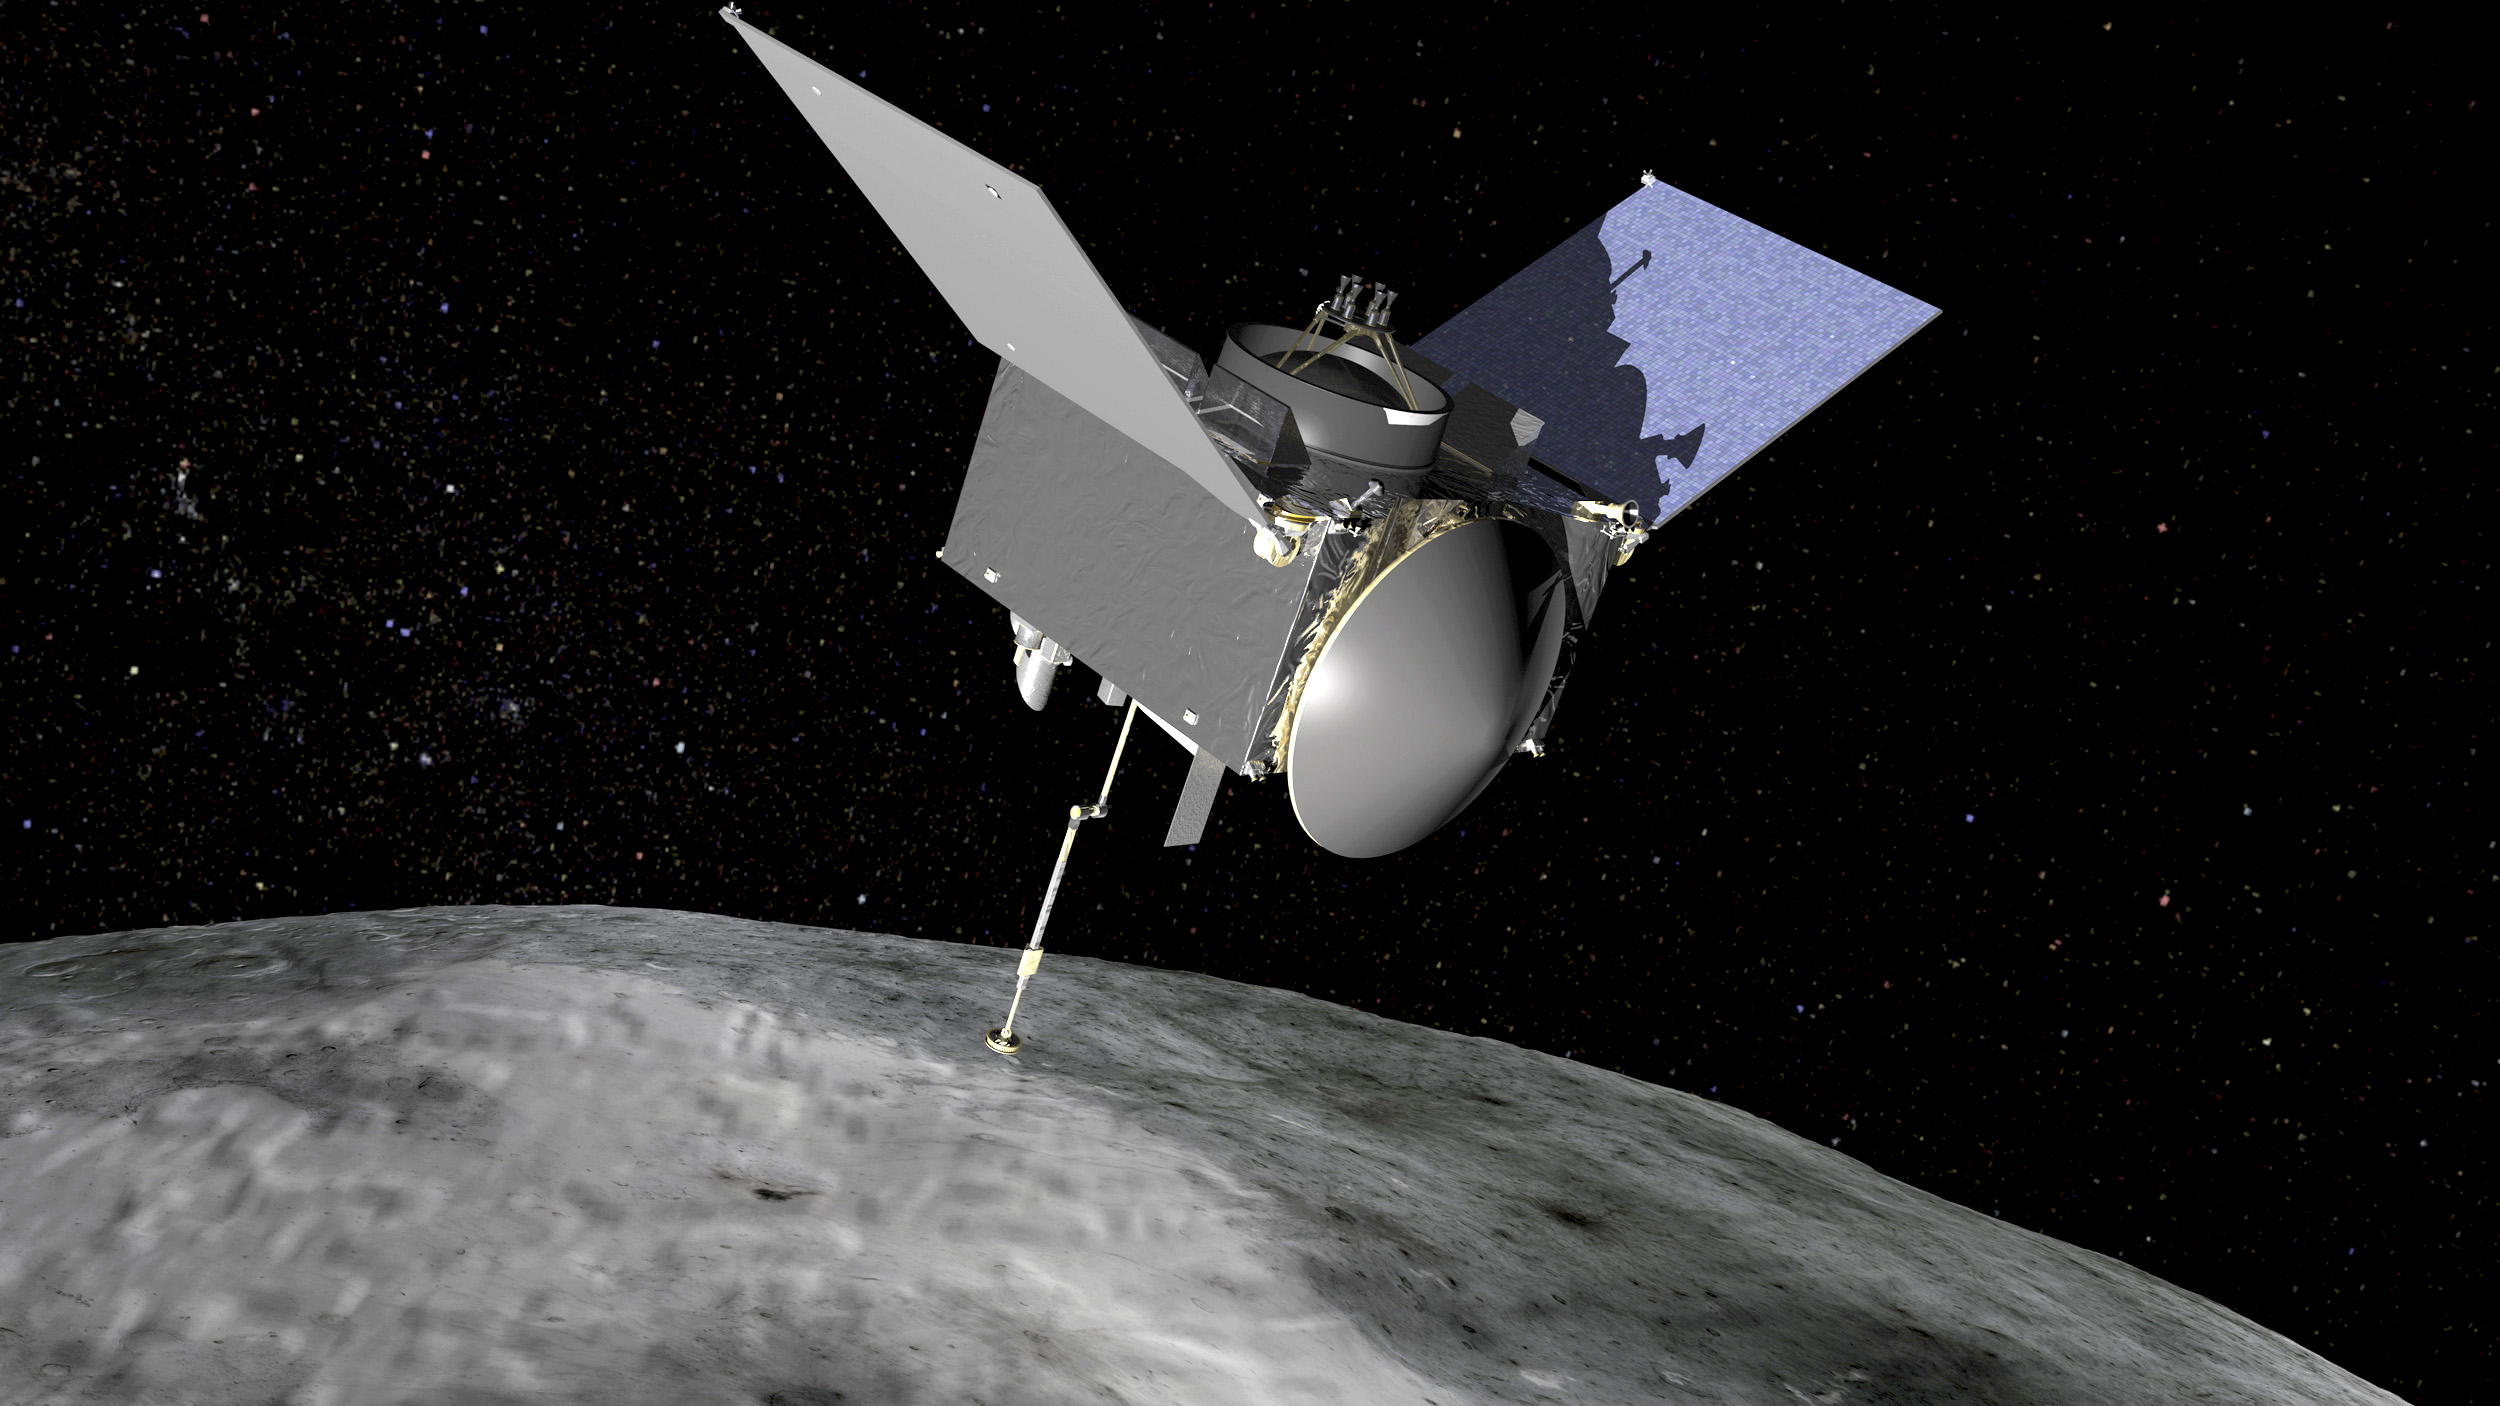 Artist rendering of NASA's OSIRIS-REx spacecraft is seen in an undated handout image